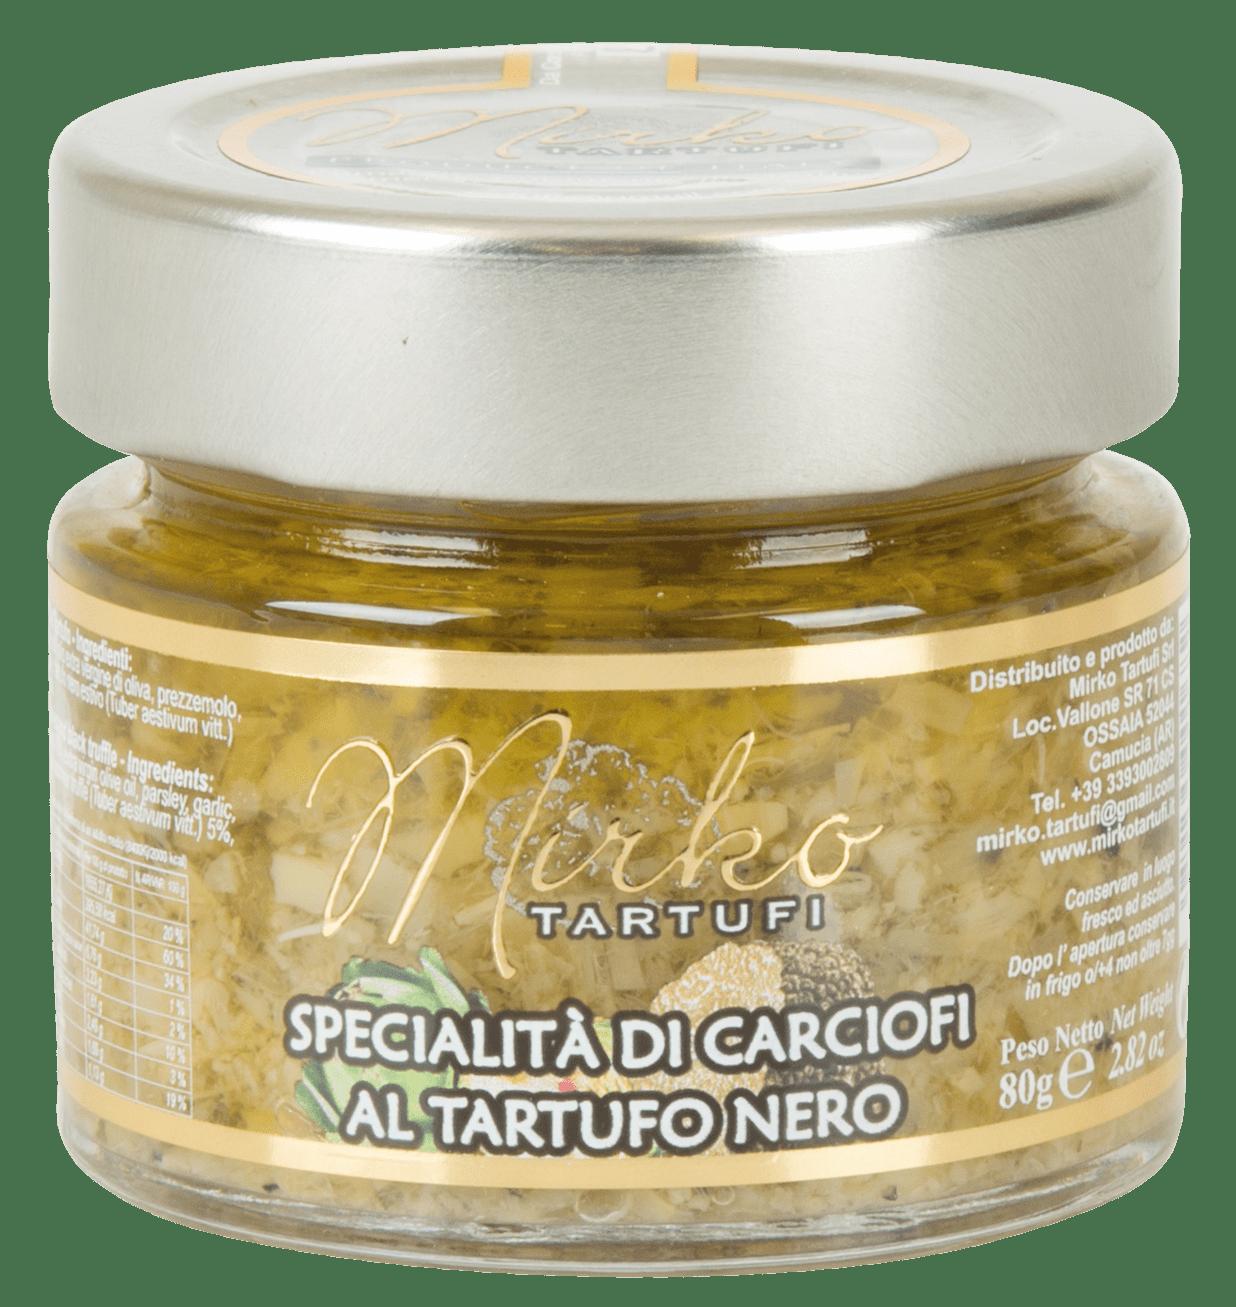 Mirko Tartufi | Specialità di Carciofi e Tartufo